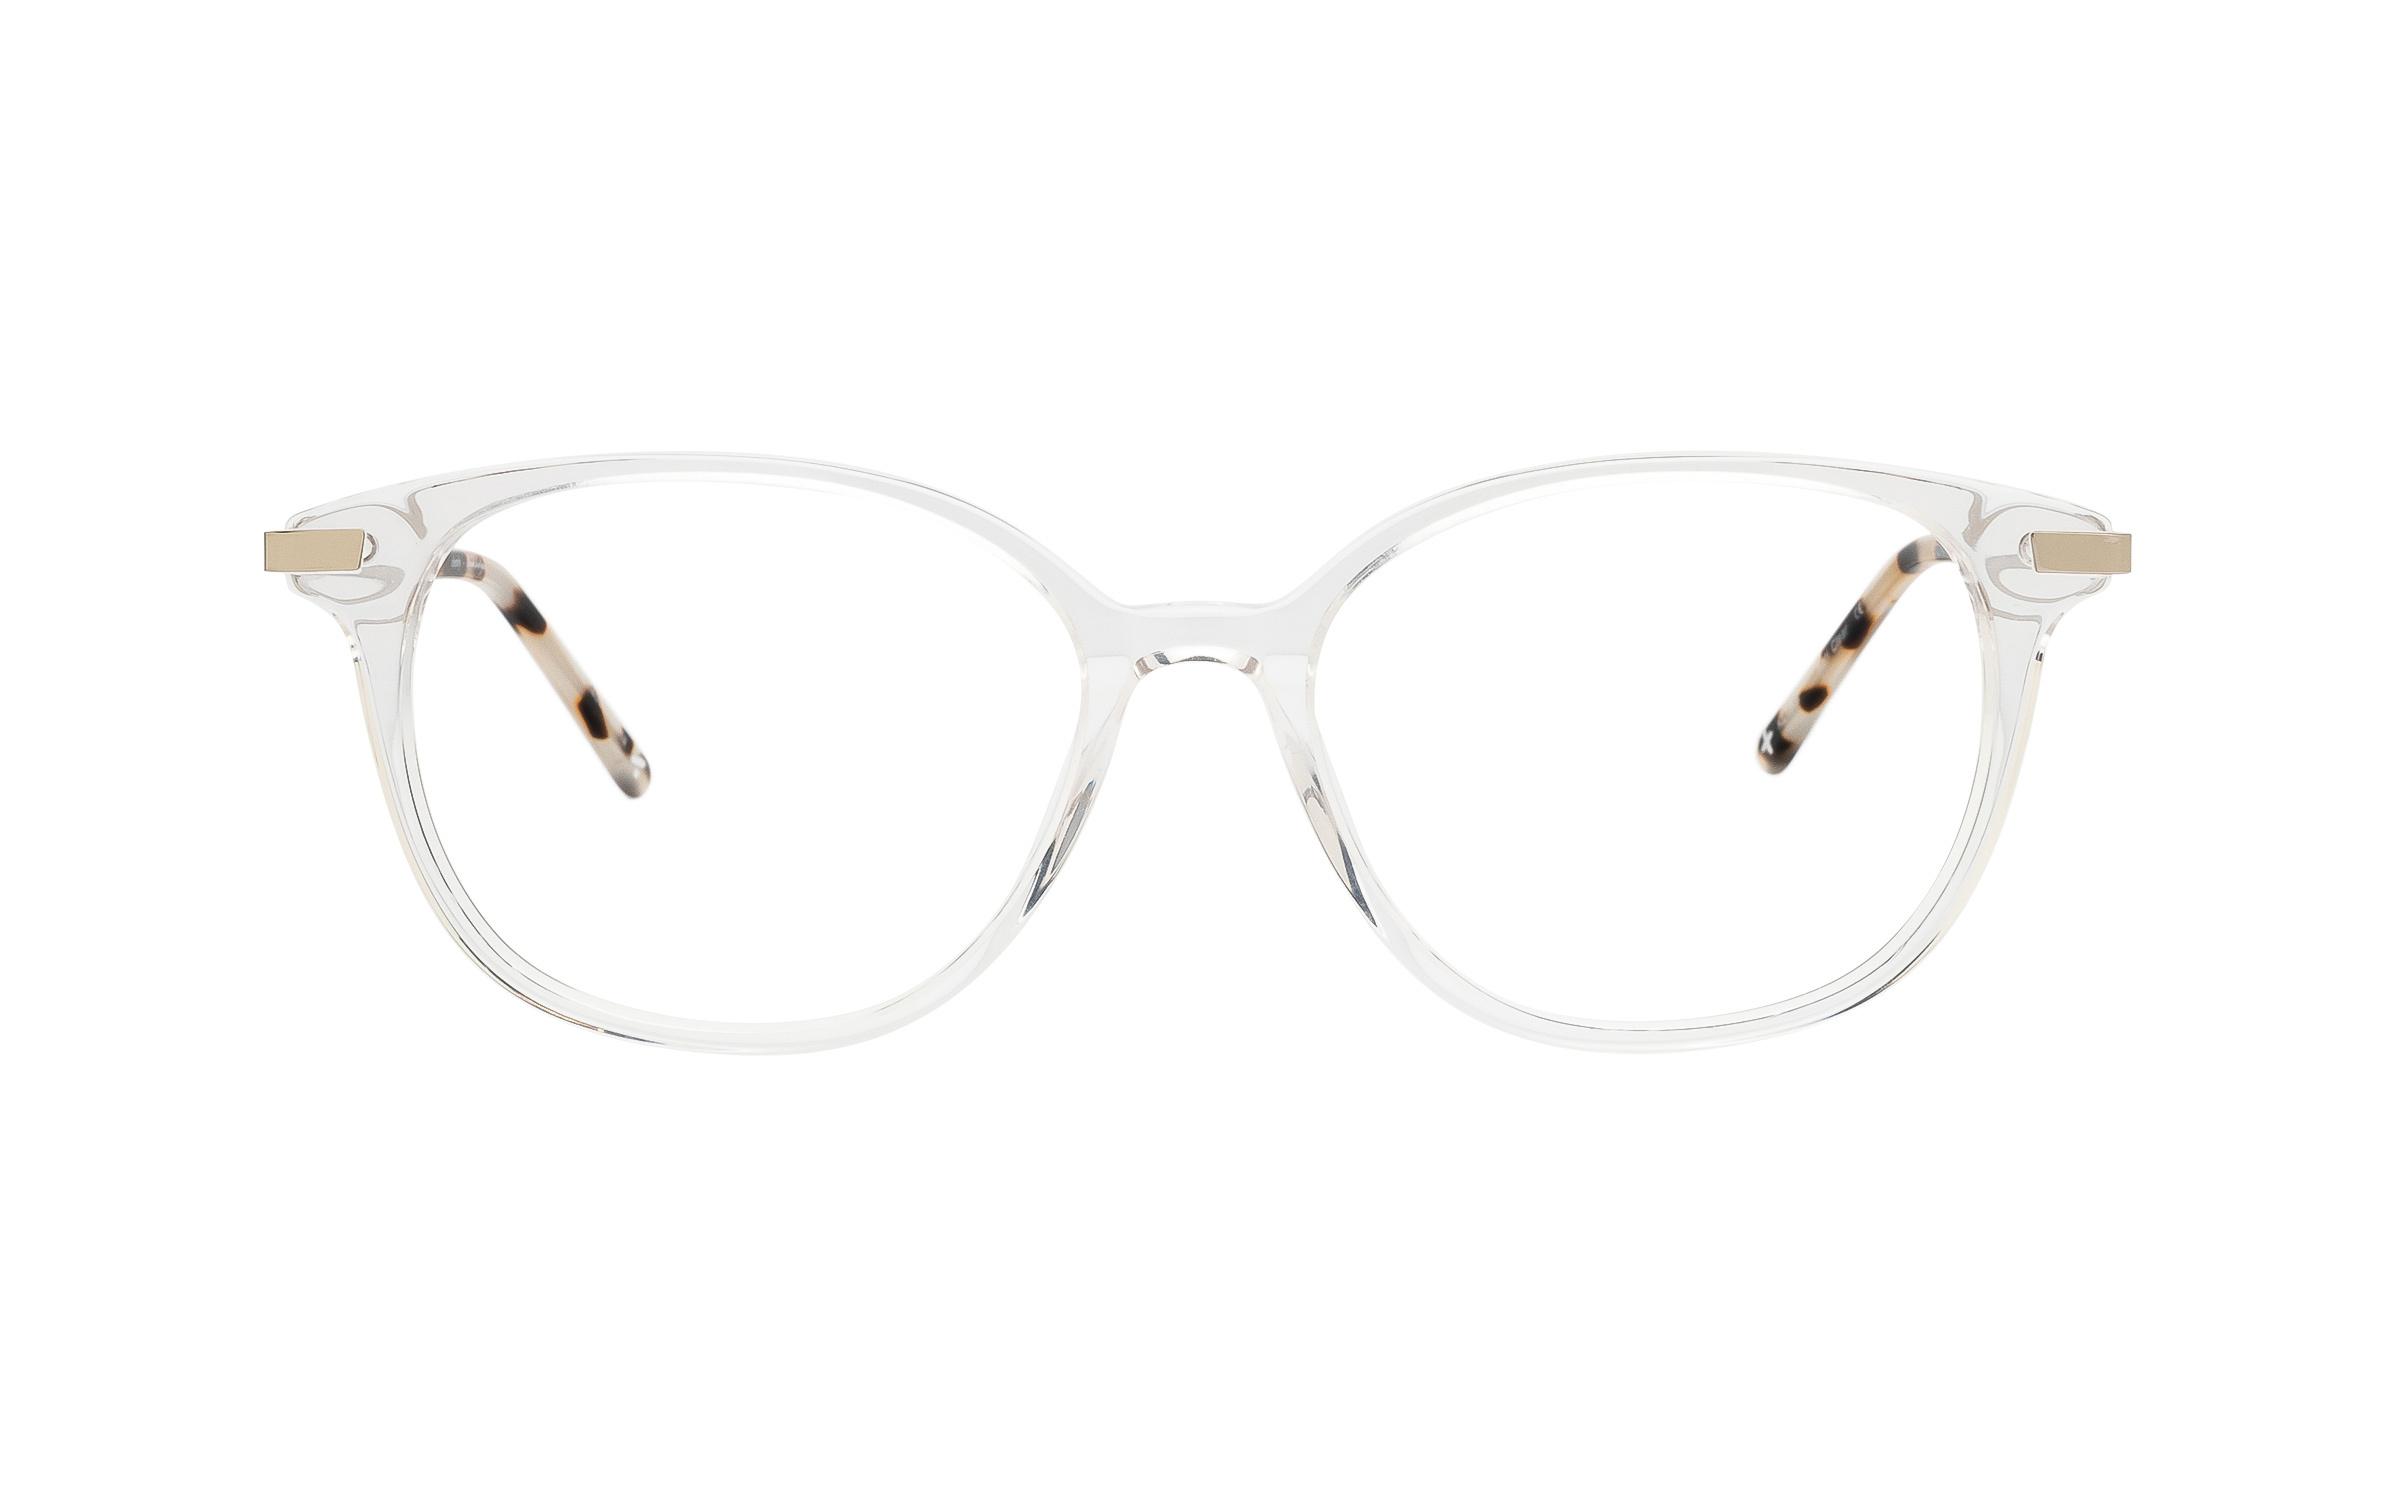 coastal.com - Derek Cardigan Kari (53) Eyeglasses and Frame in Clear | Acetate/Metal – Online Coastal 55.00 USD